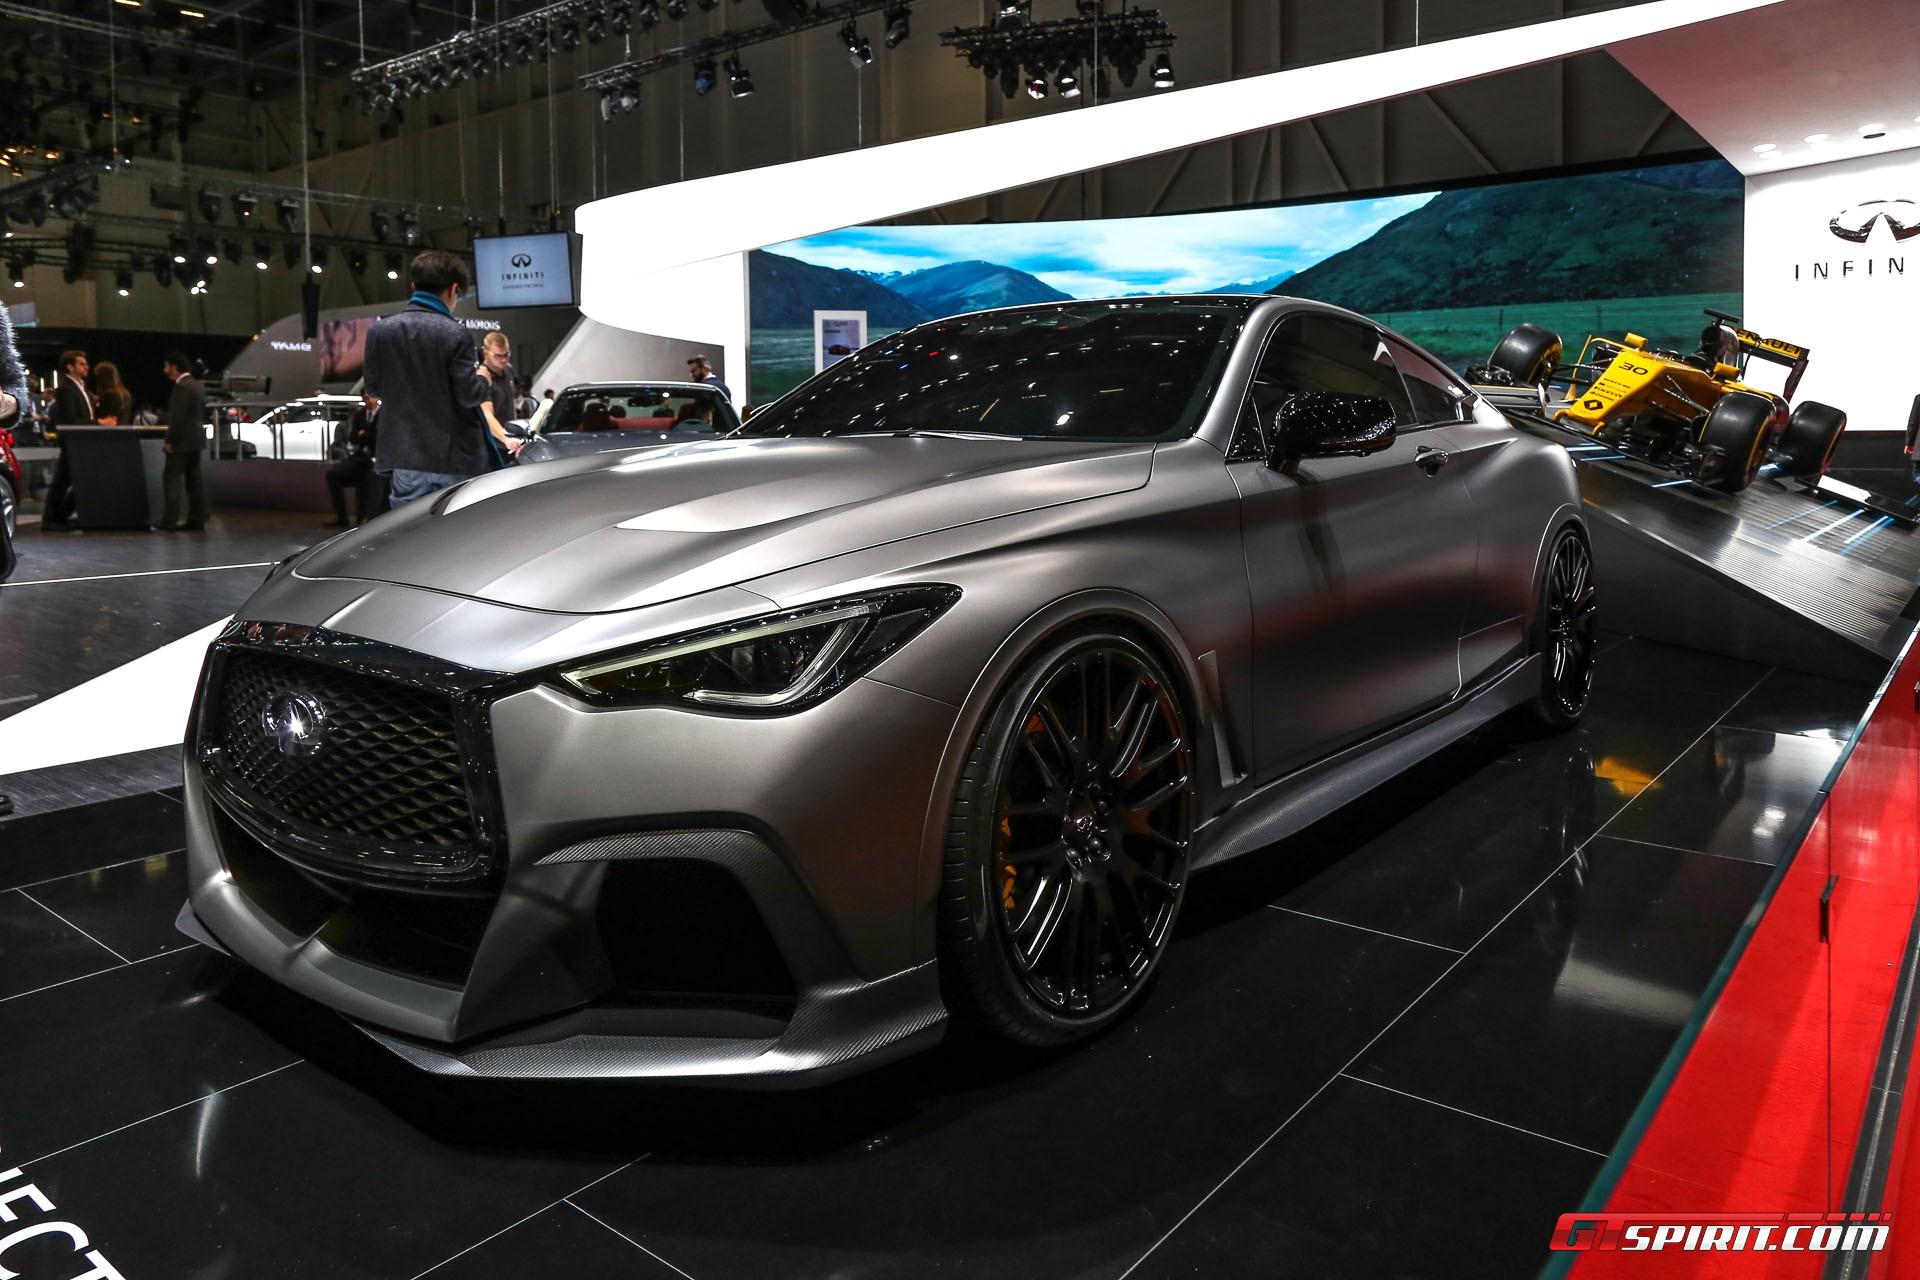 Geneva 2017: Infiniti Project Black S Concept - GTspirit